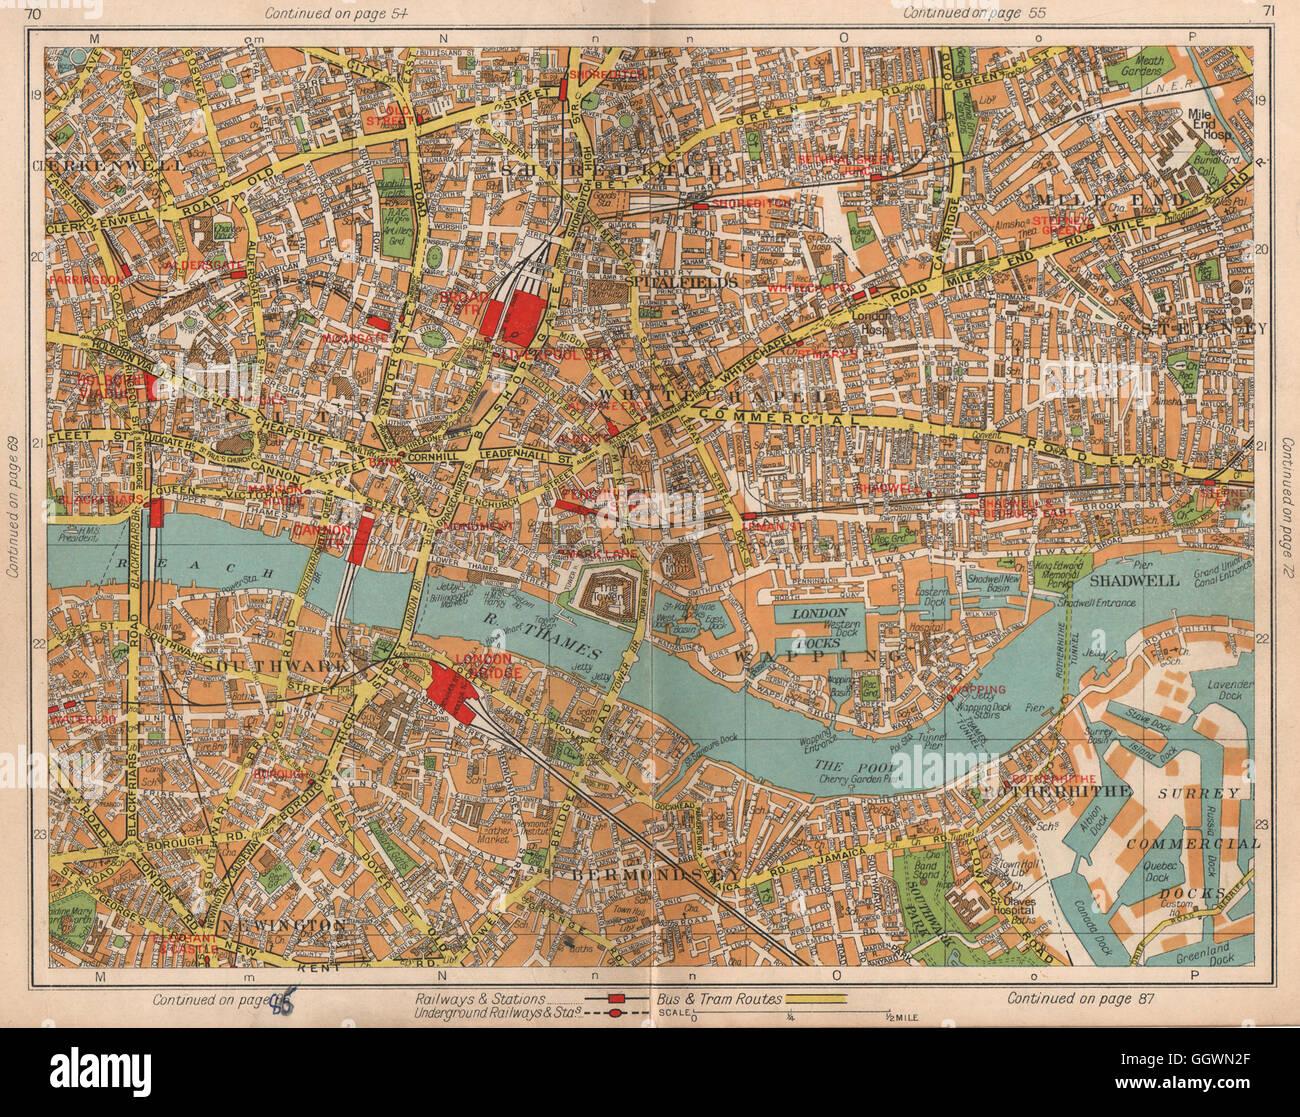 Shoreditch London Map Stock Photos Shoreditch London Map Stock